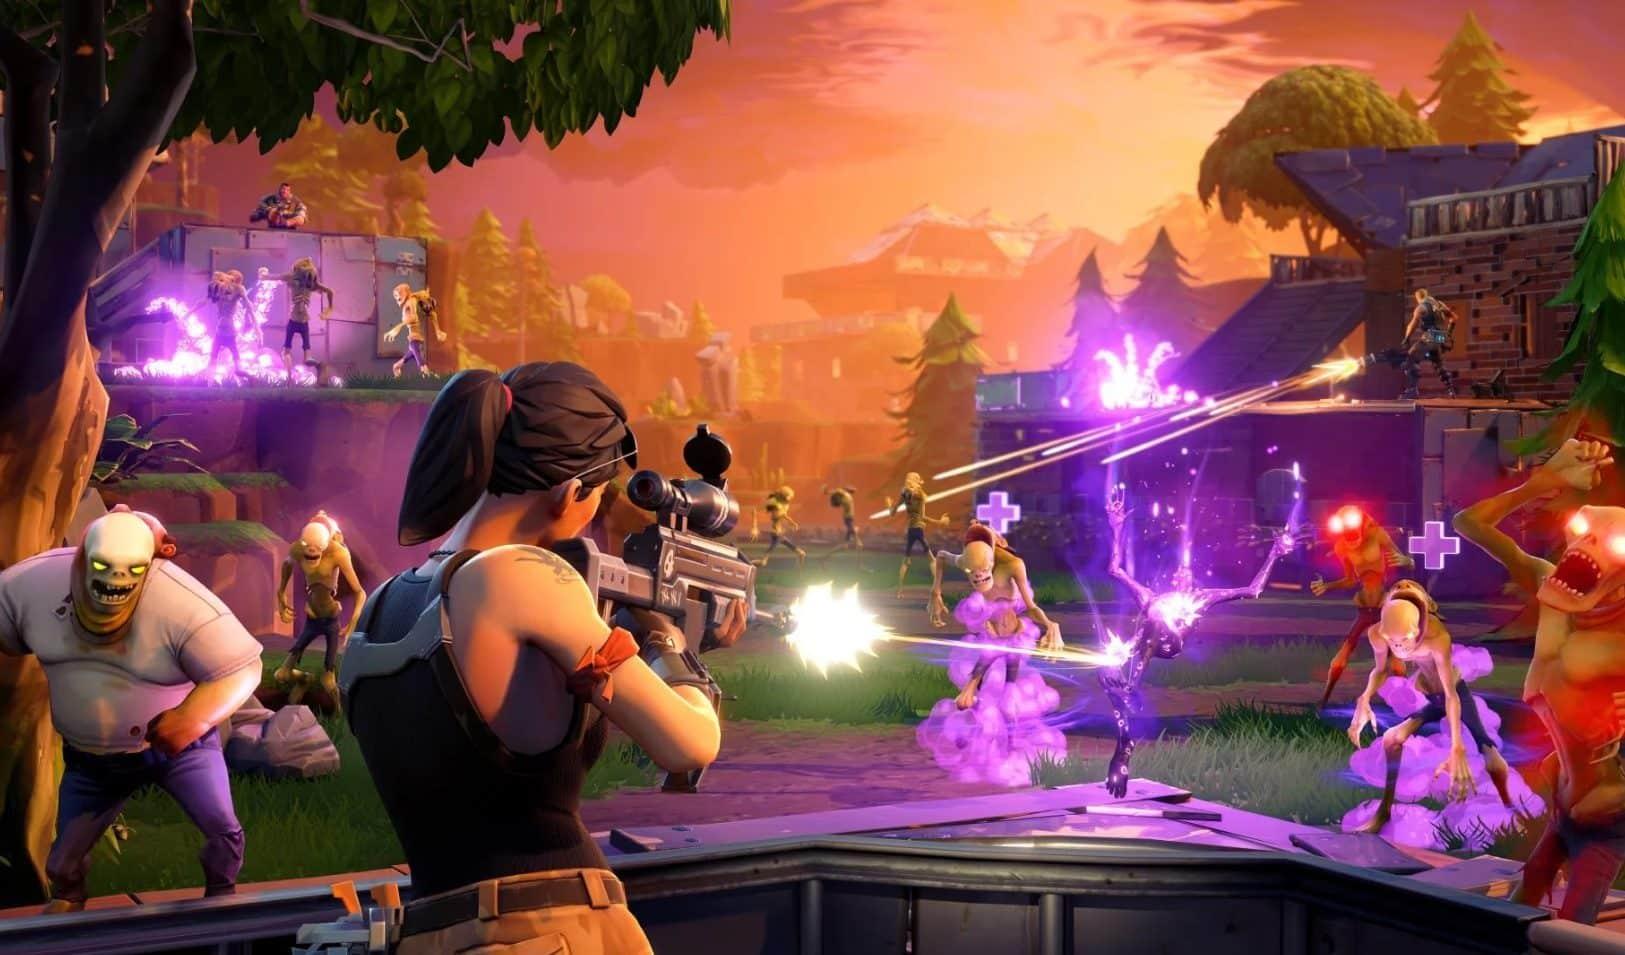 fortnite video game season 4 update save the world